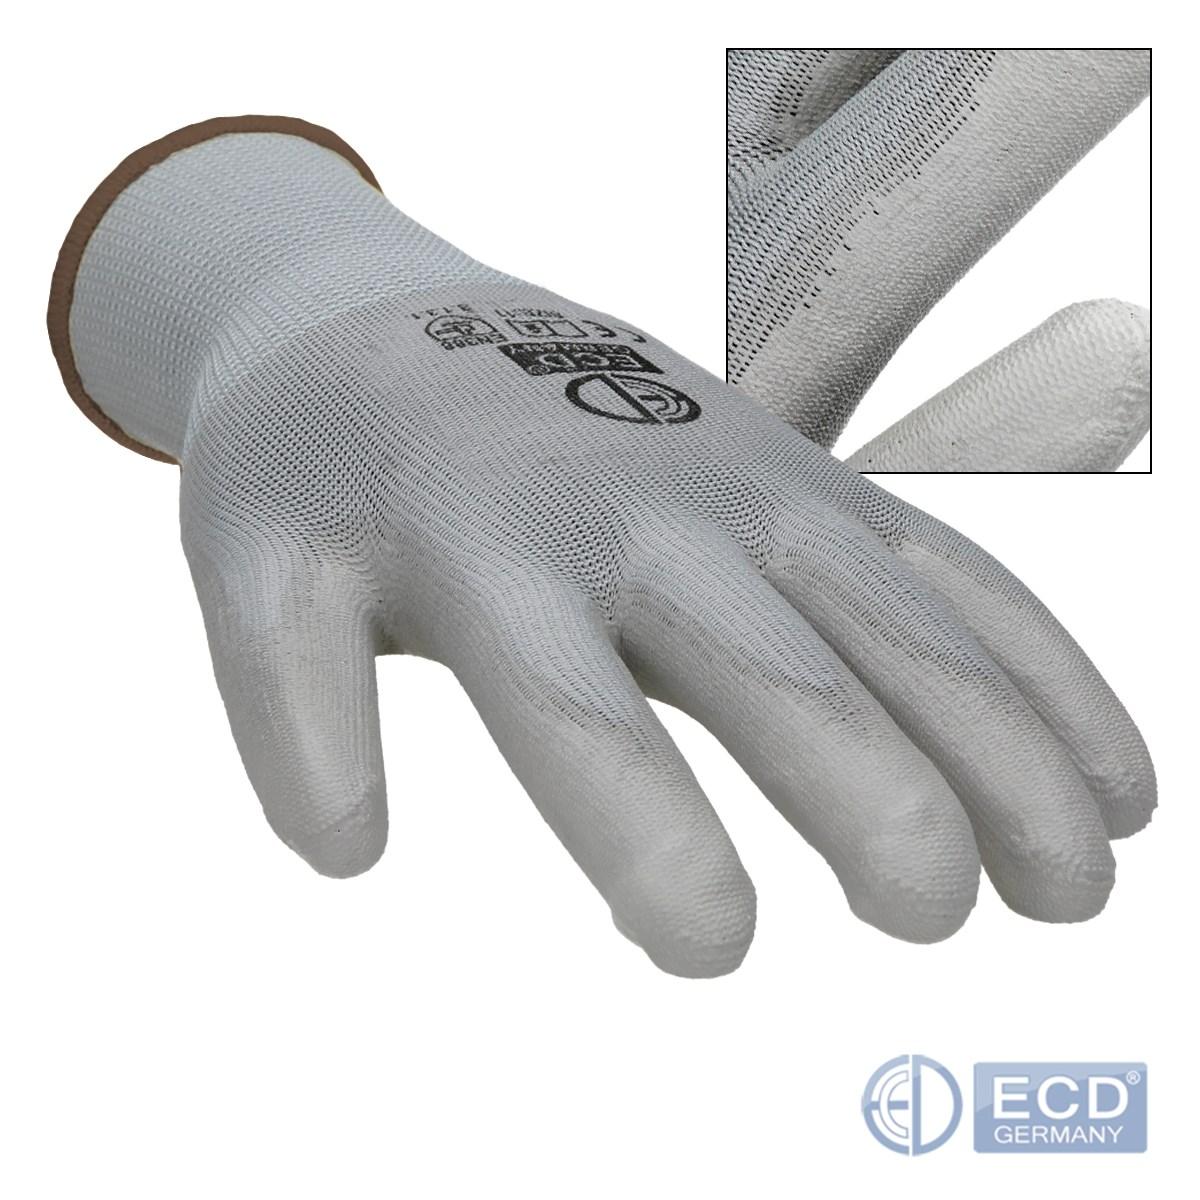 24-Pares-gris-negro-PU-guantes-de-montaje-para-mecanica-versatiles-tamano-S-XXL